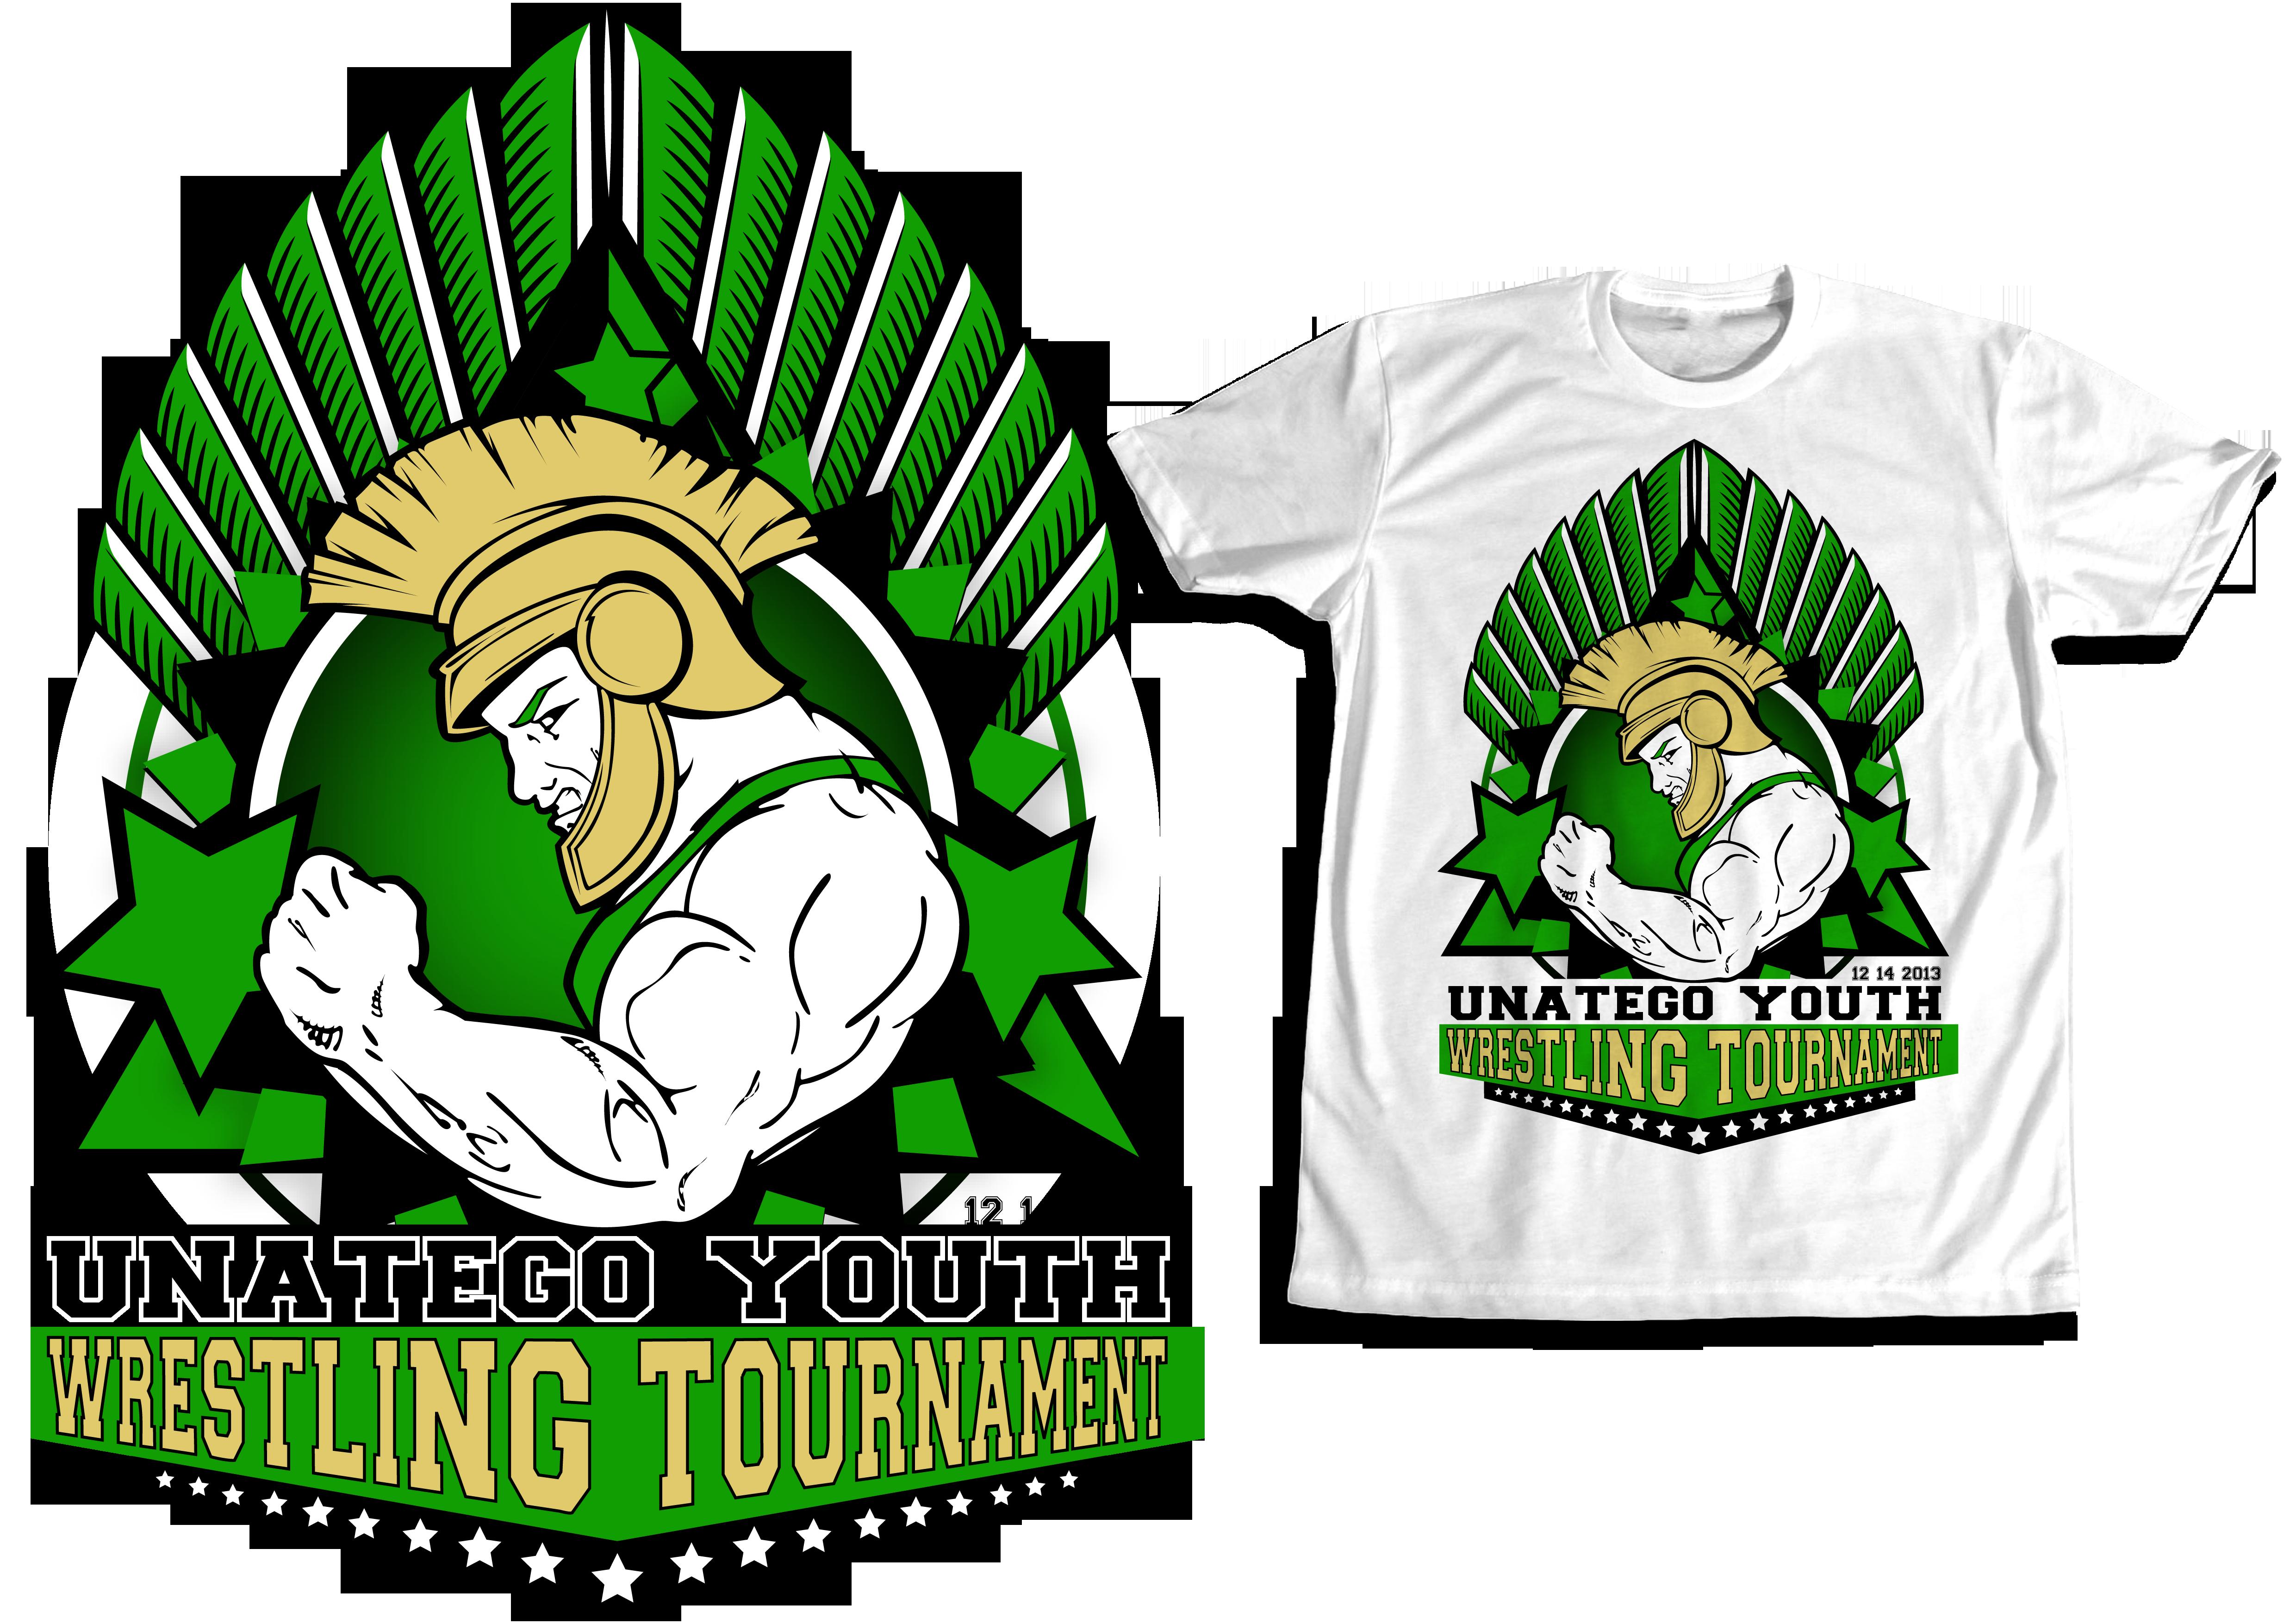 2013-12-14-Unatego-Youth-Wrestling-Tournament-layered